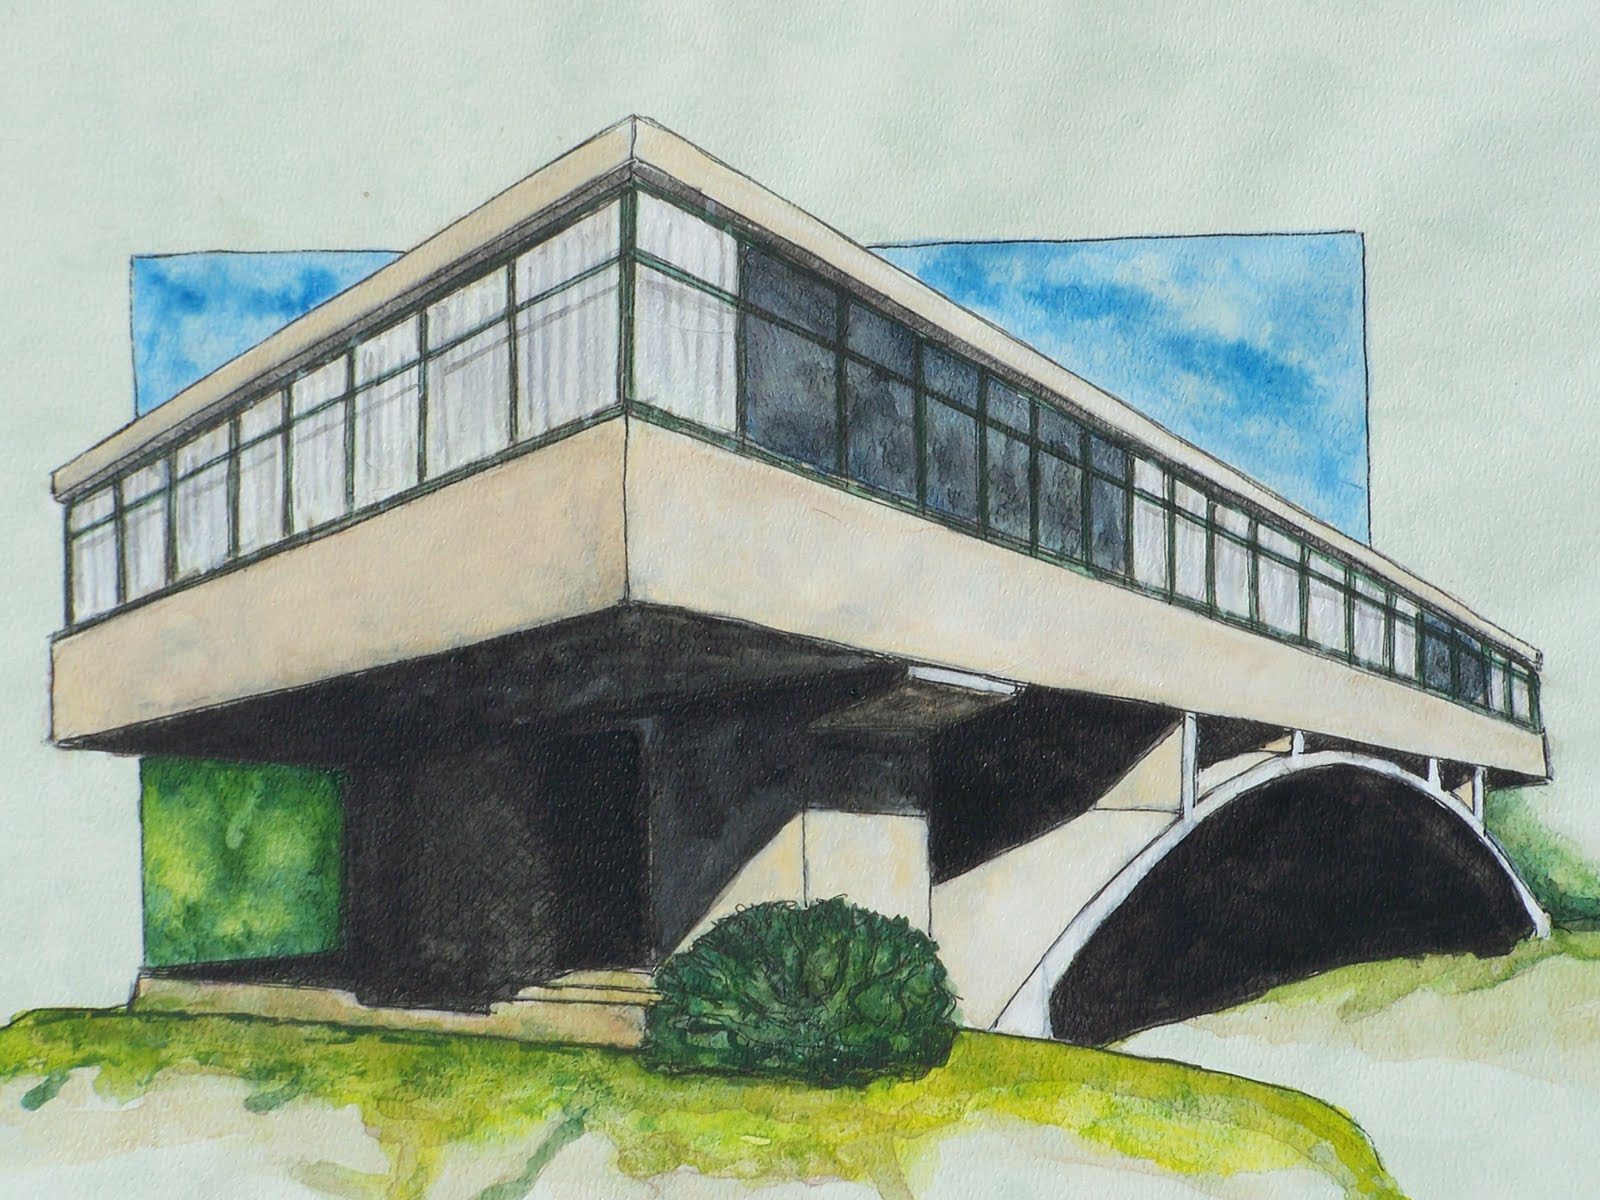 Urbans la casa del puente mar del plata - La casa del puente regules ...